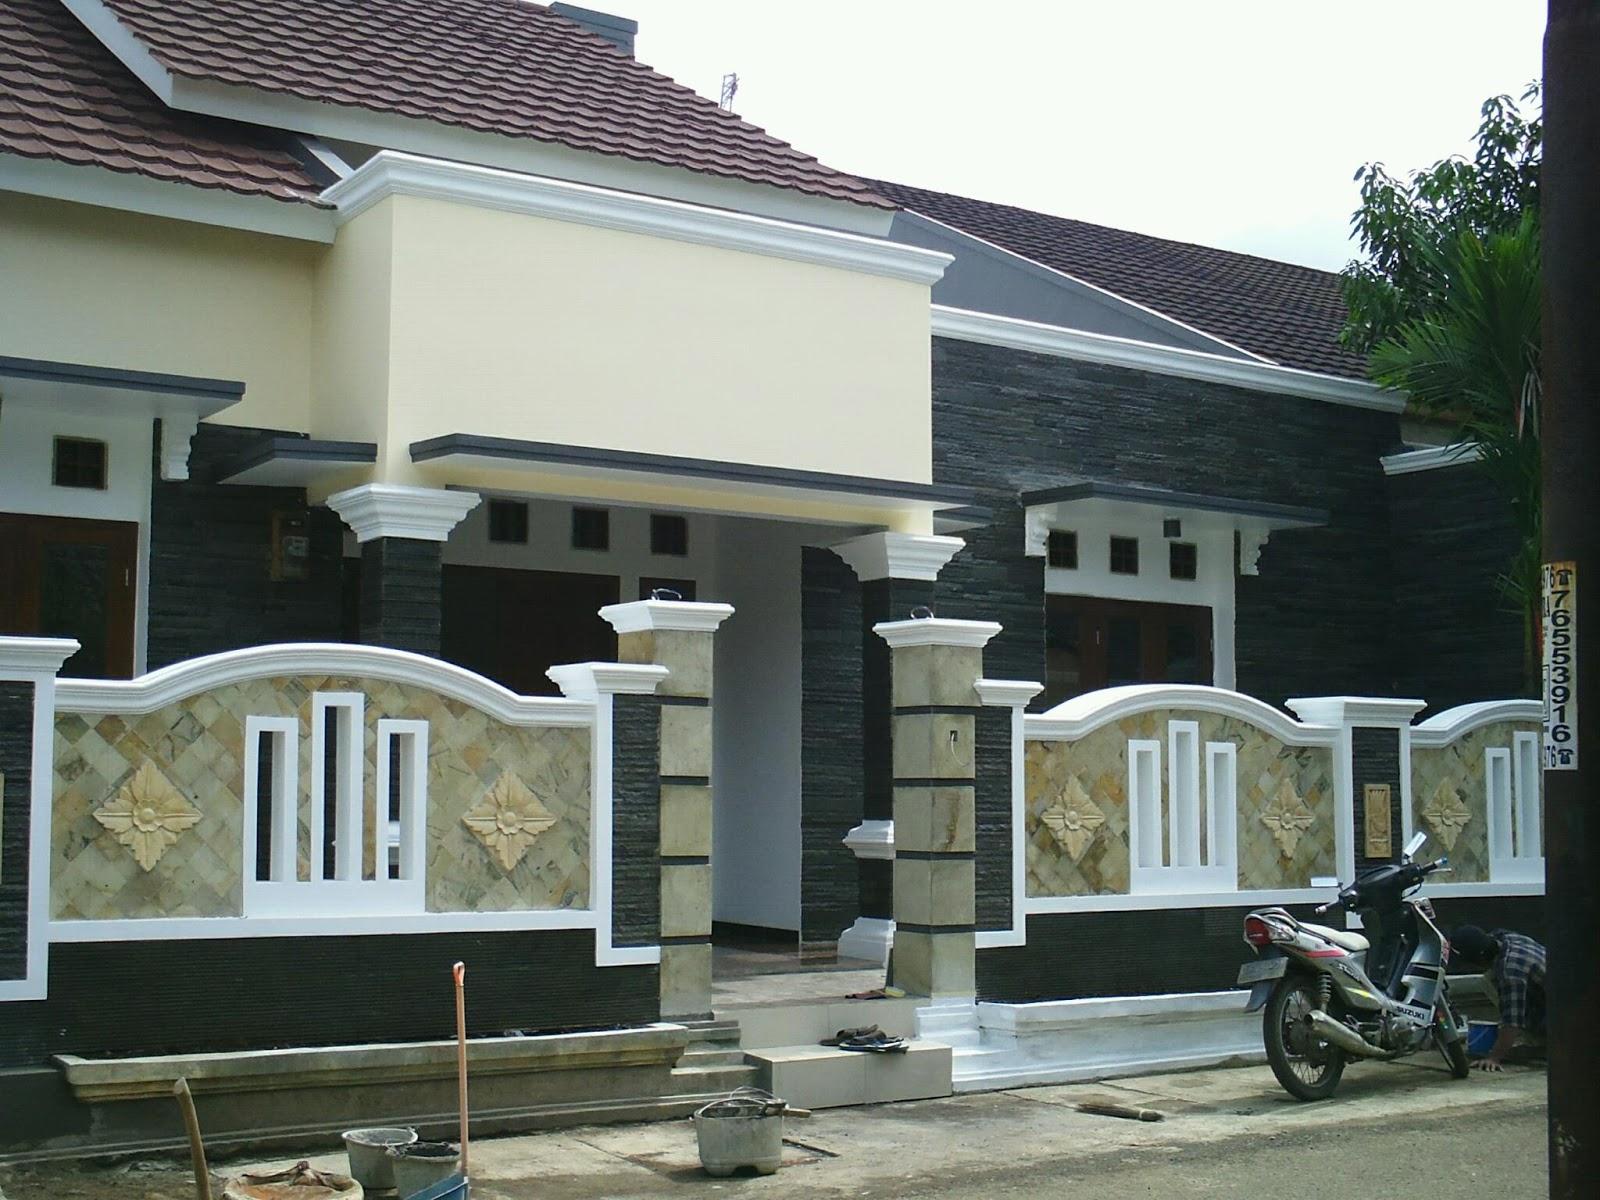 14 Desain Pagar Rumah Minimalis Dari Batu Alam Terbaru Plafon Gypsum Larantuka